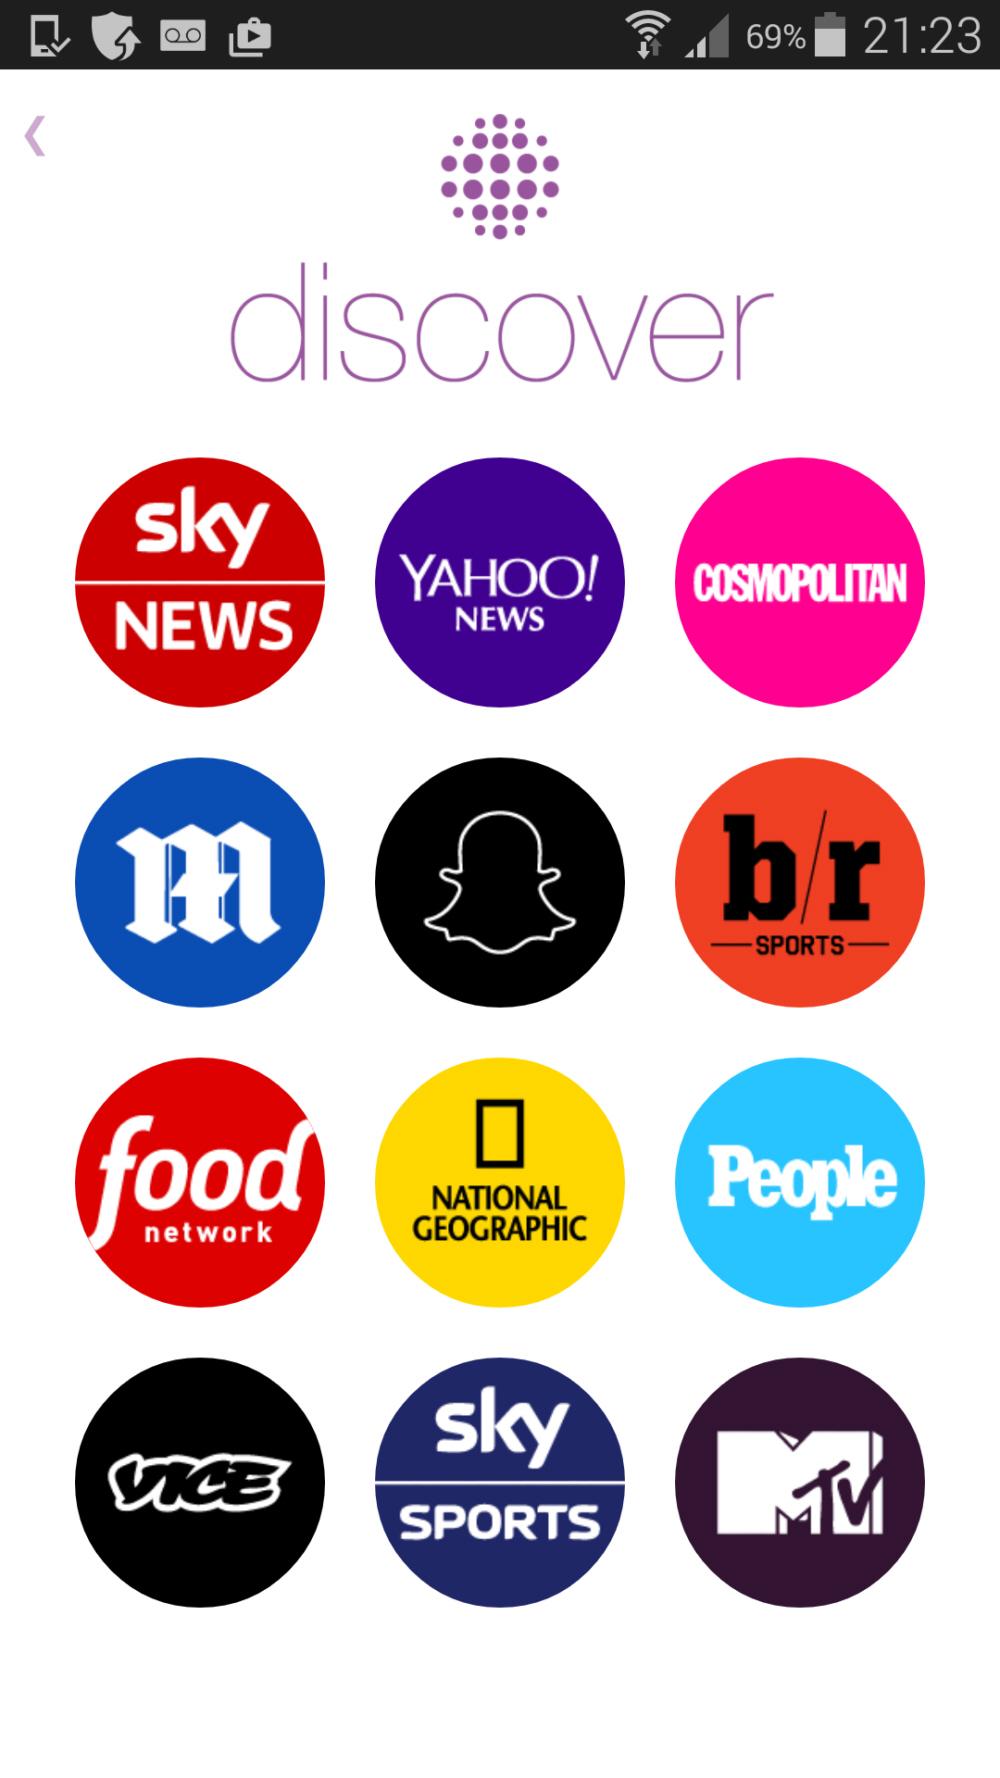 SnapchatDiscoverScreenshot_20Feb15_1000.jpg